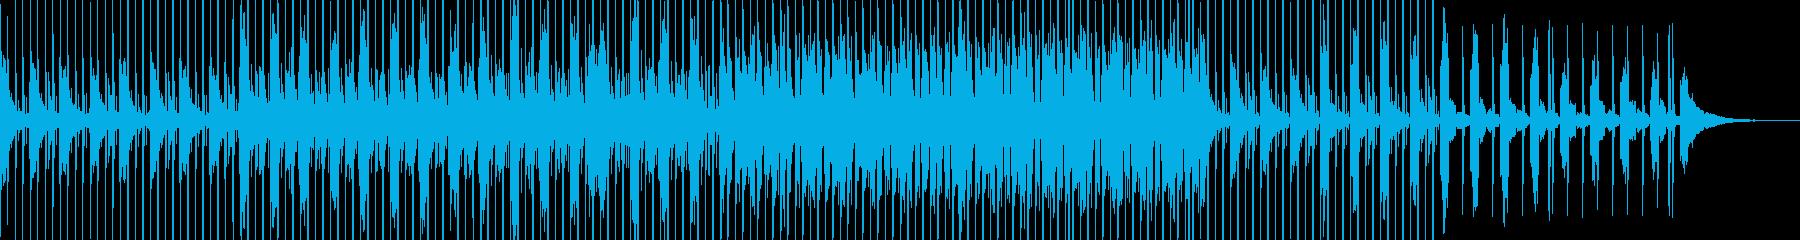 Positive Pop の再生済みの波形